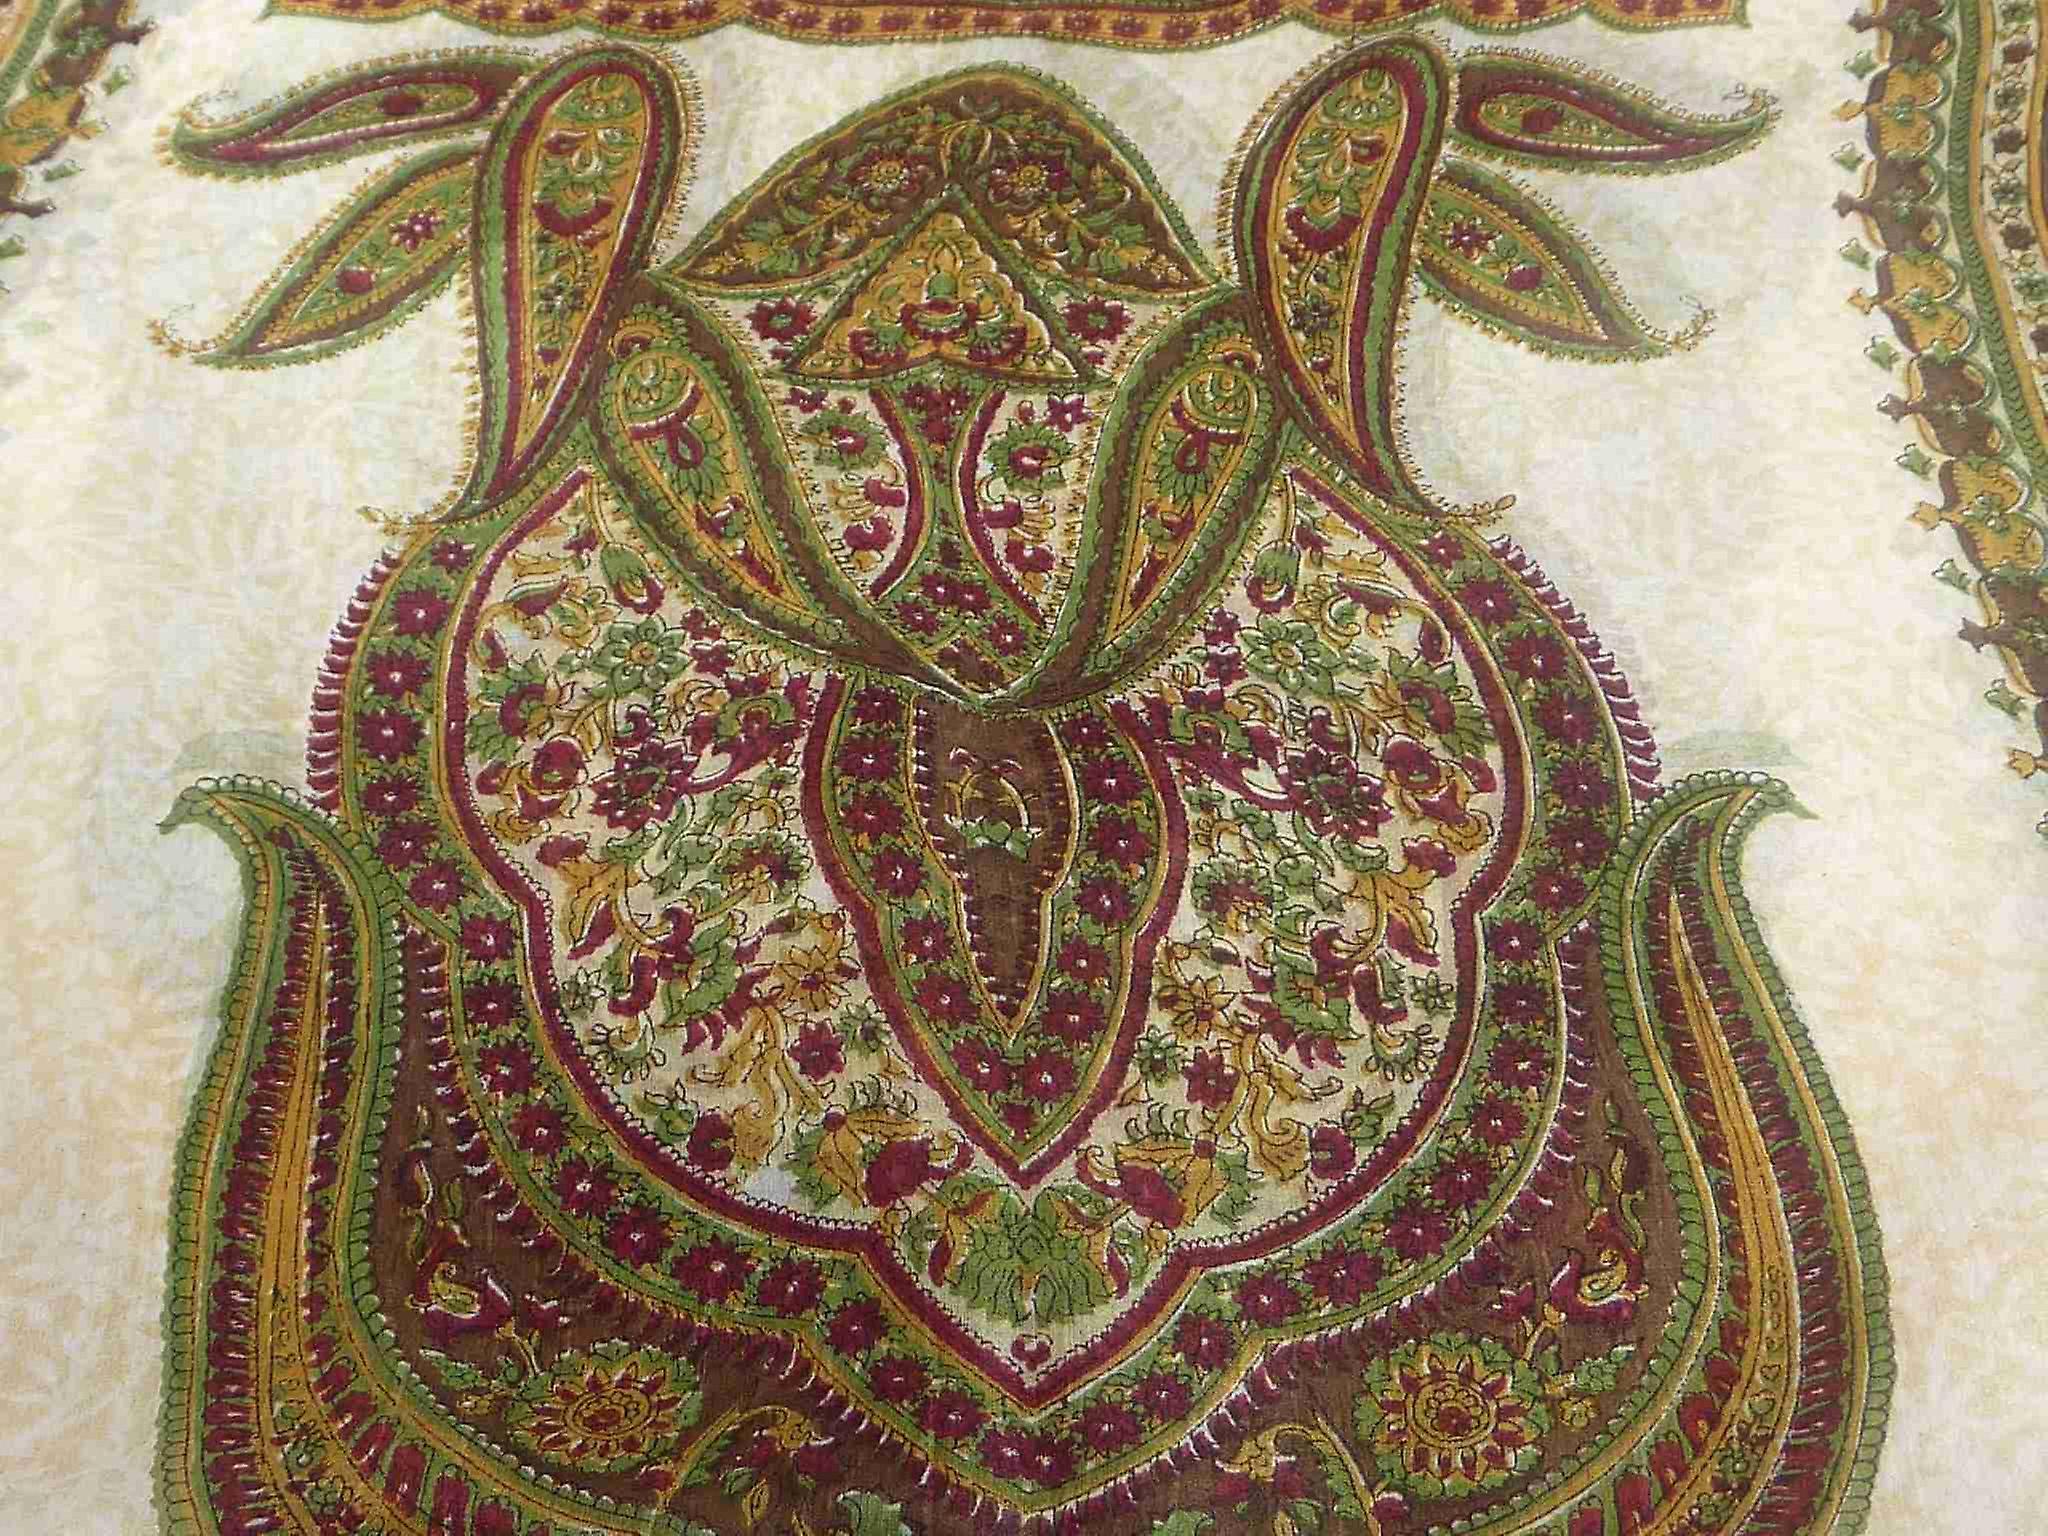 Mulberry Silk Traditional Long Scarf Mina Caramel by Pashmina & Silk